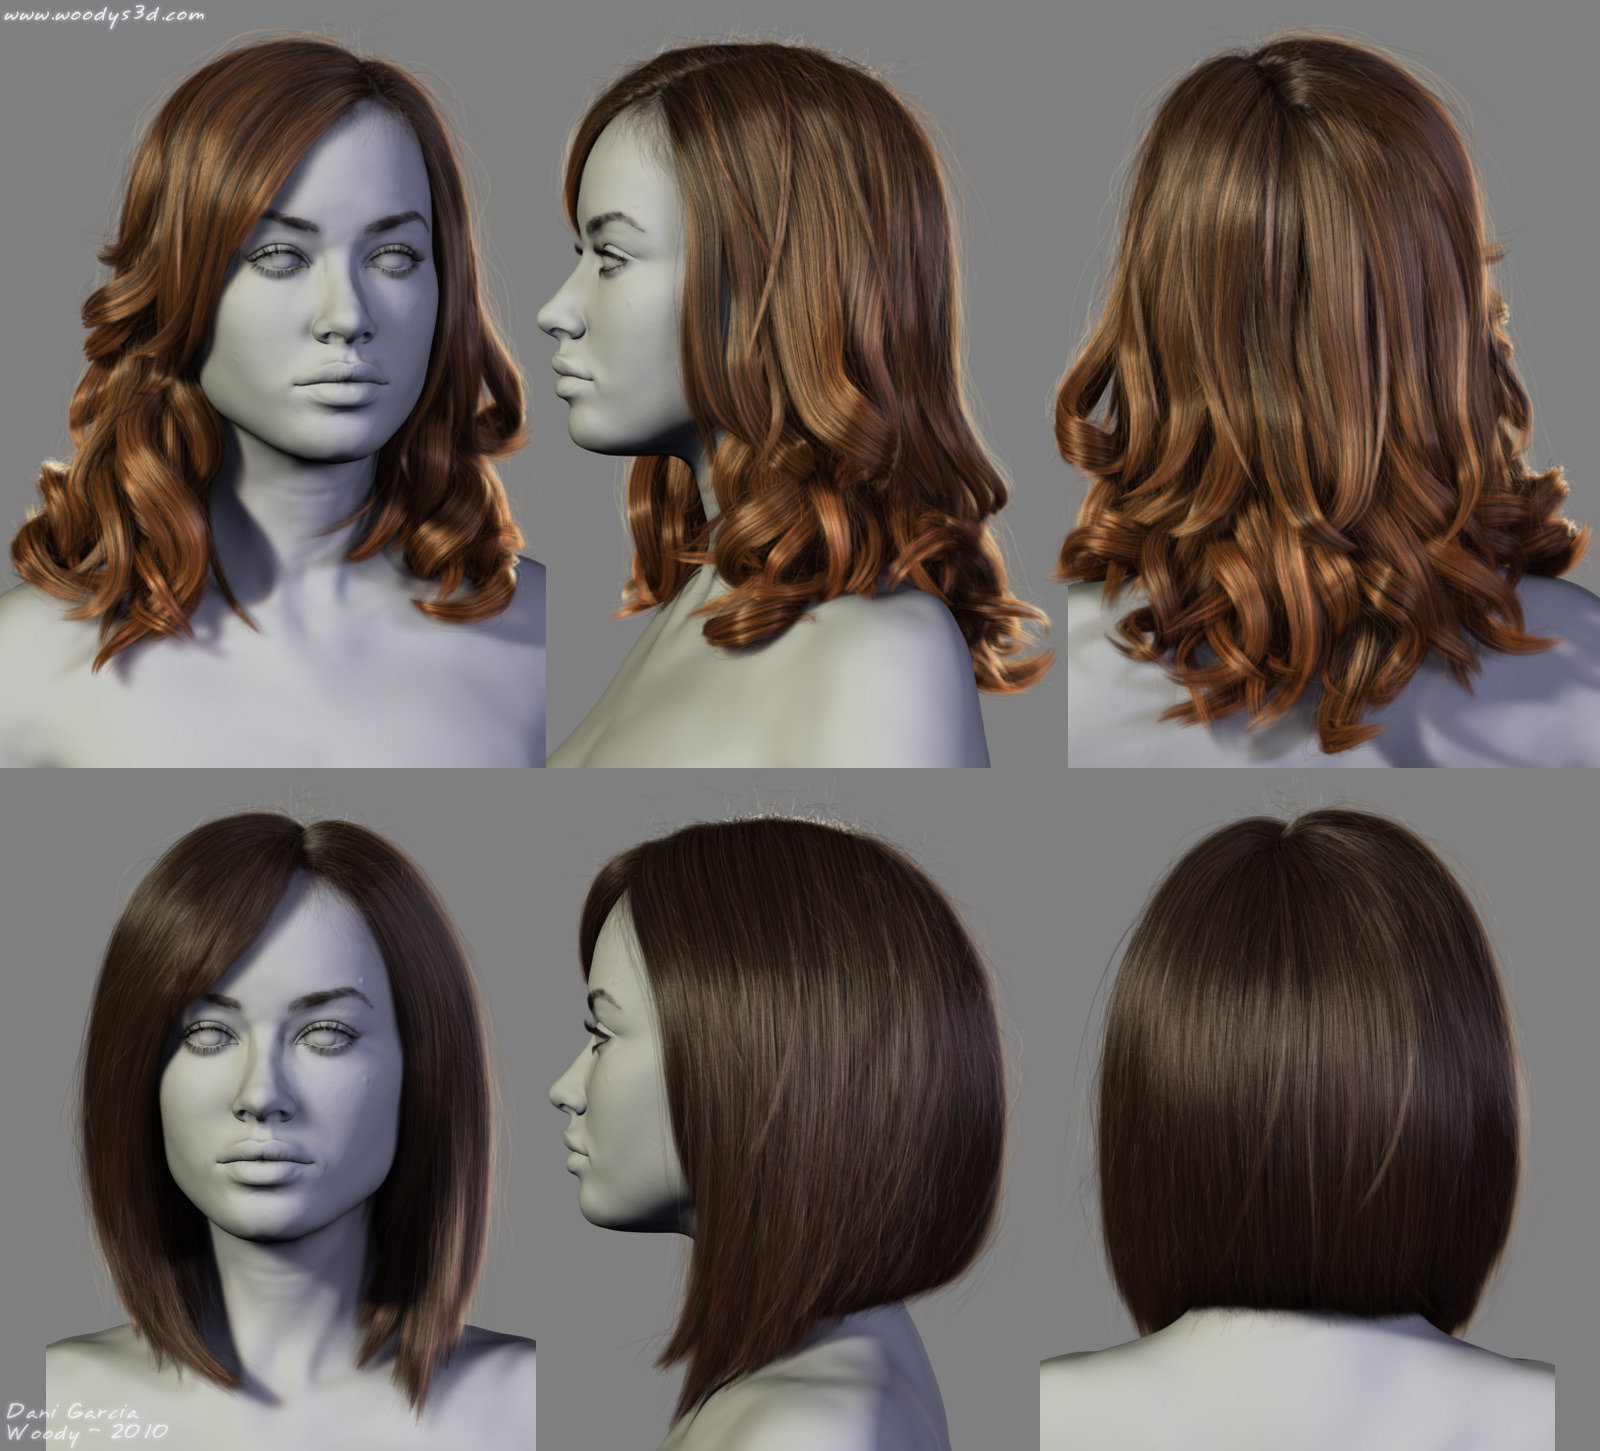 Artstation 4 New Hairstyles Dani Garcia